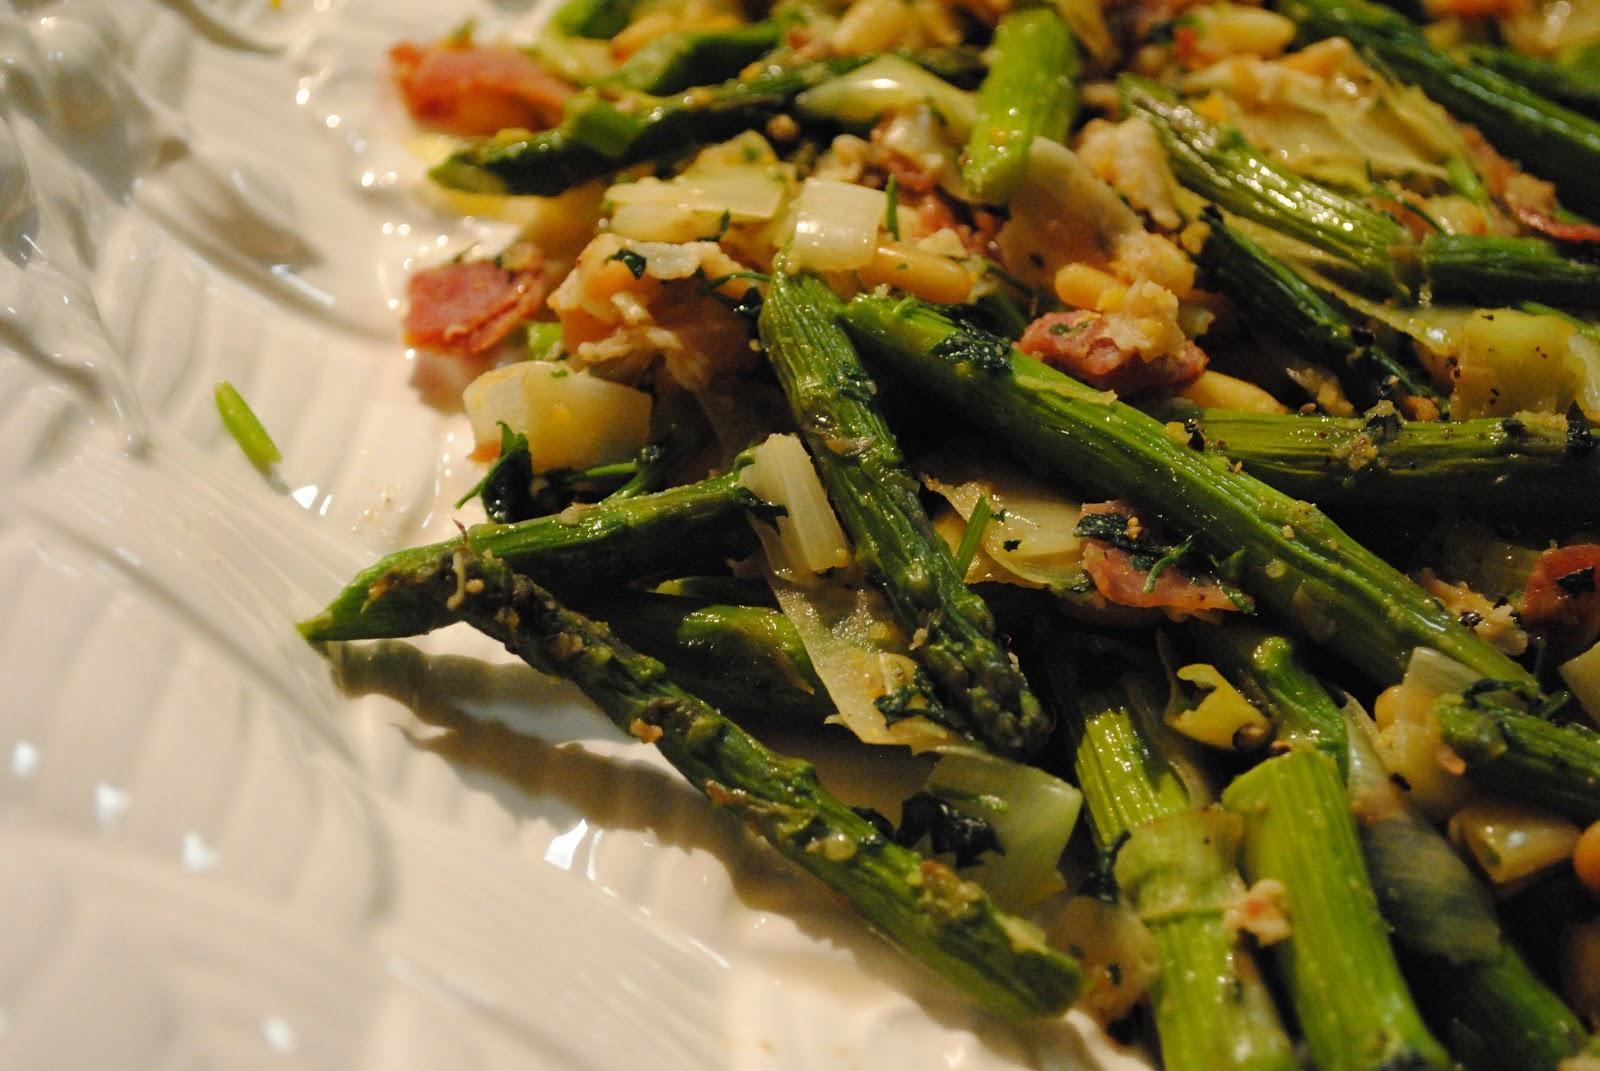 Culinary Adventures with Camilla: A Food52 Potluck